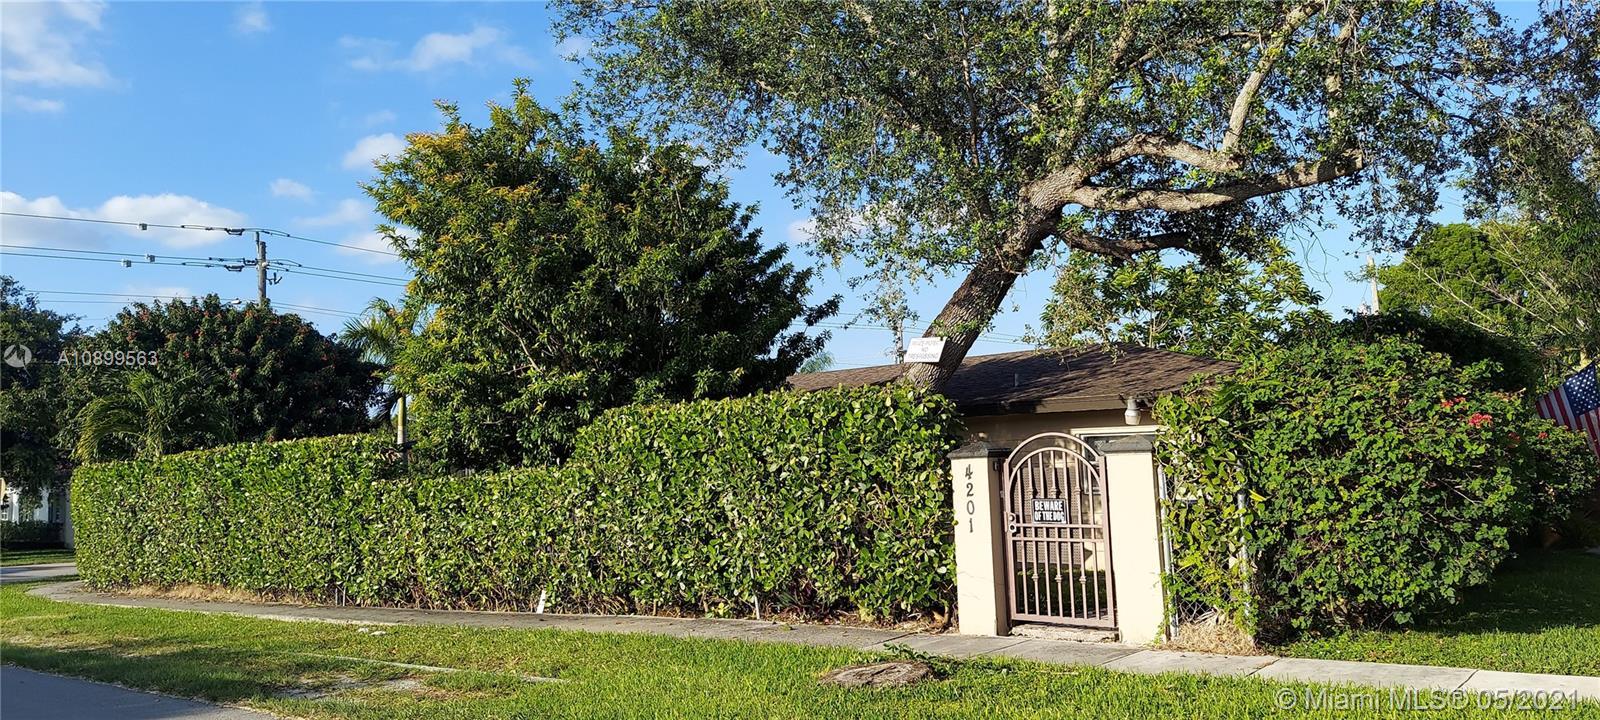 4201 SW 60 place #2 Property Photo